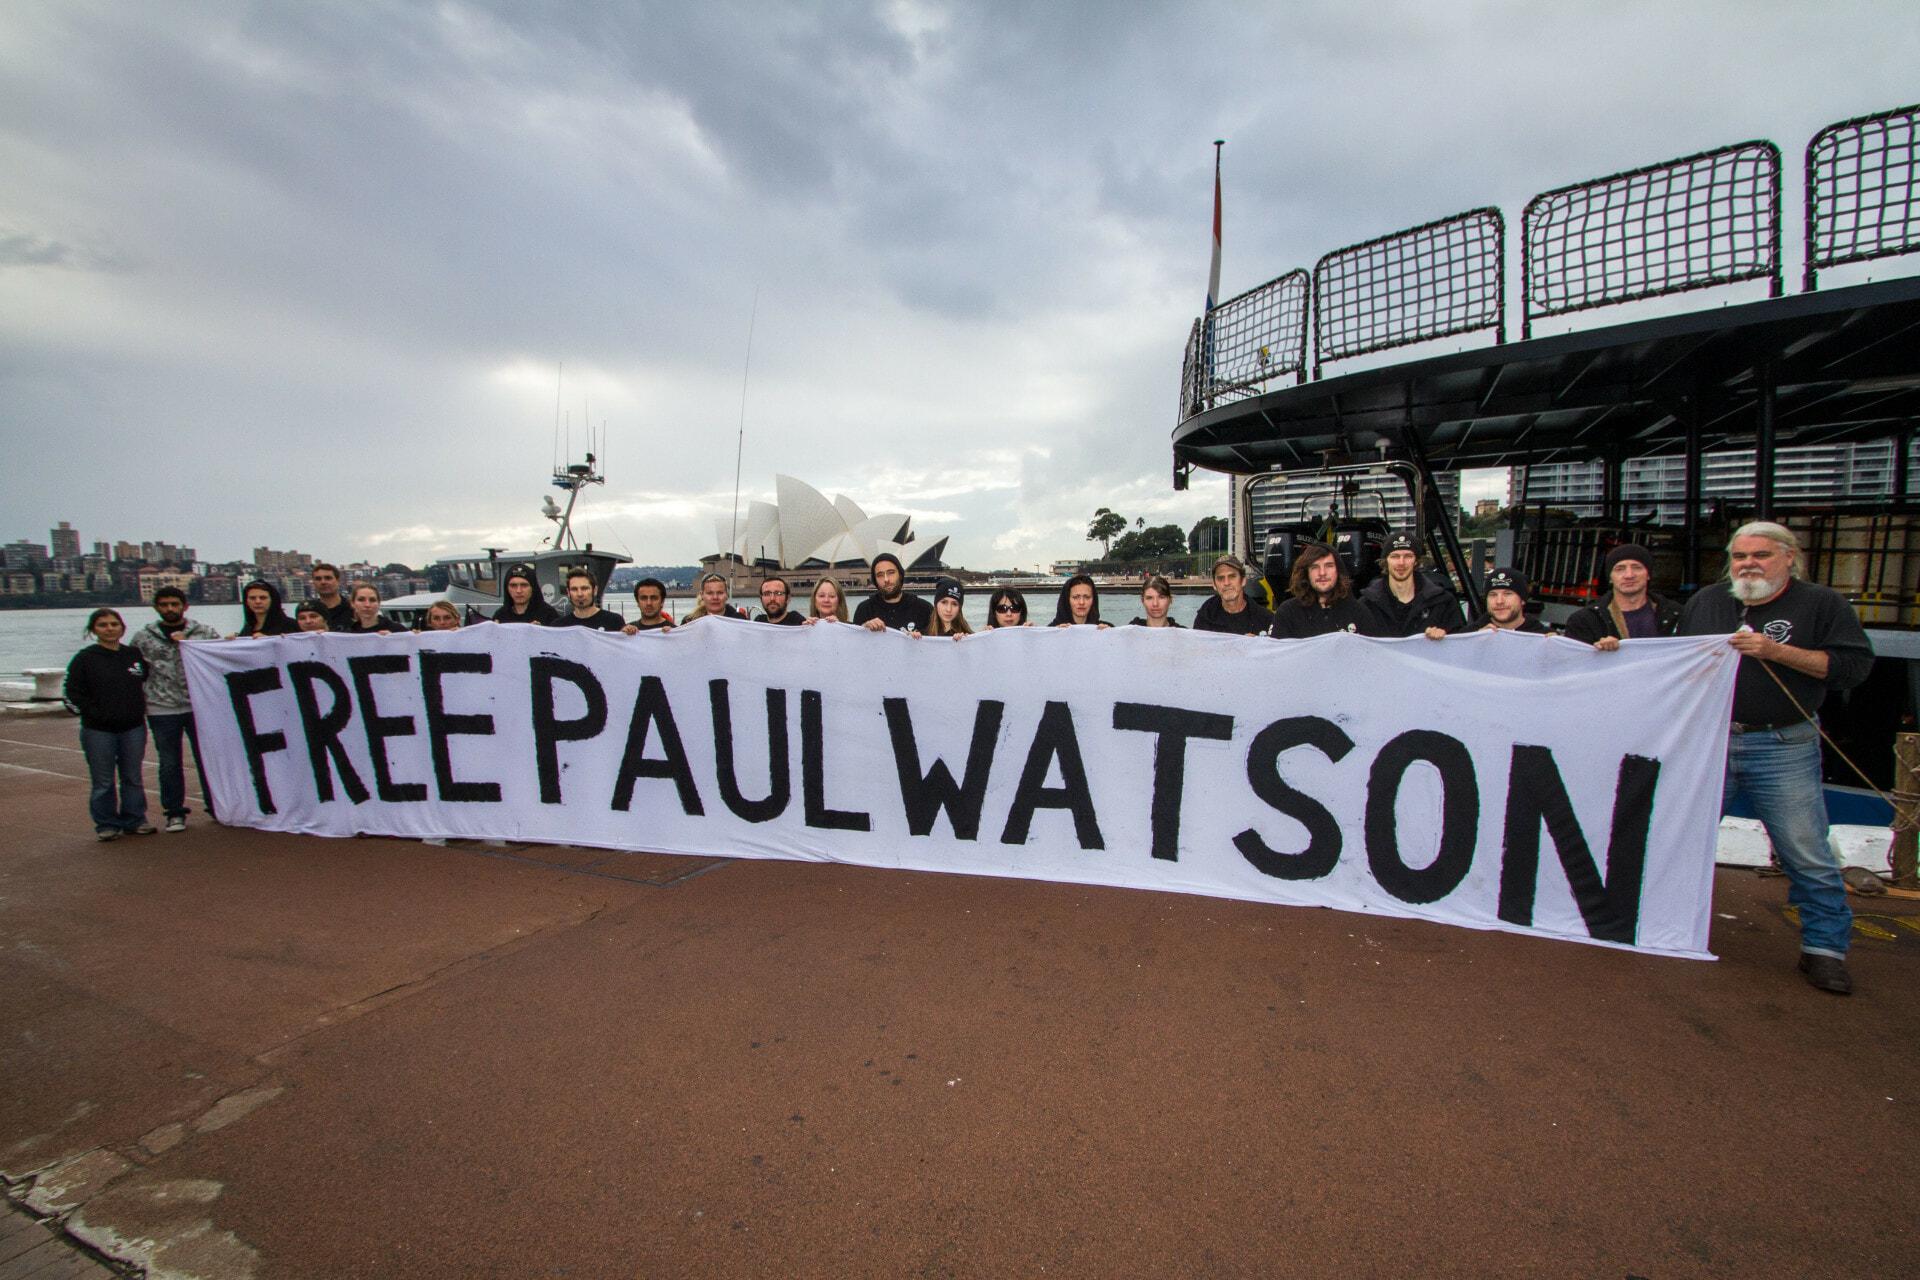 120610_SA_ Sydney_ Barker_Bardot_crews_holding_Free_Paul_Watson_Banner_6721